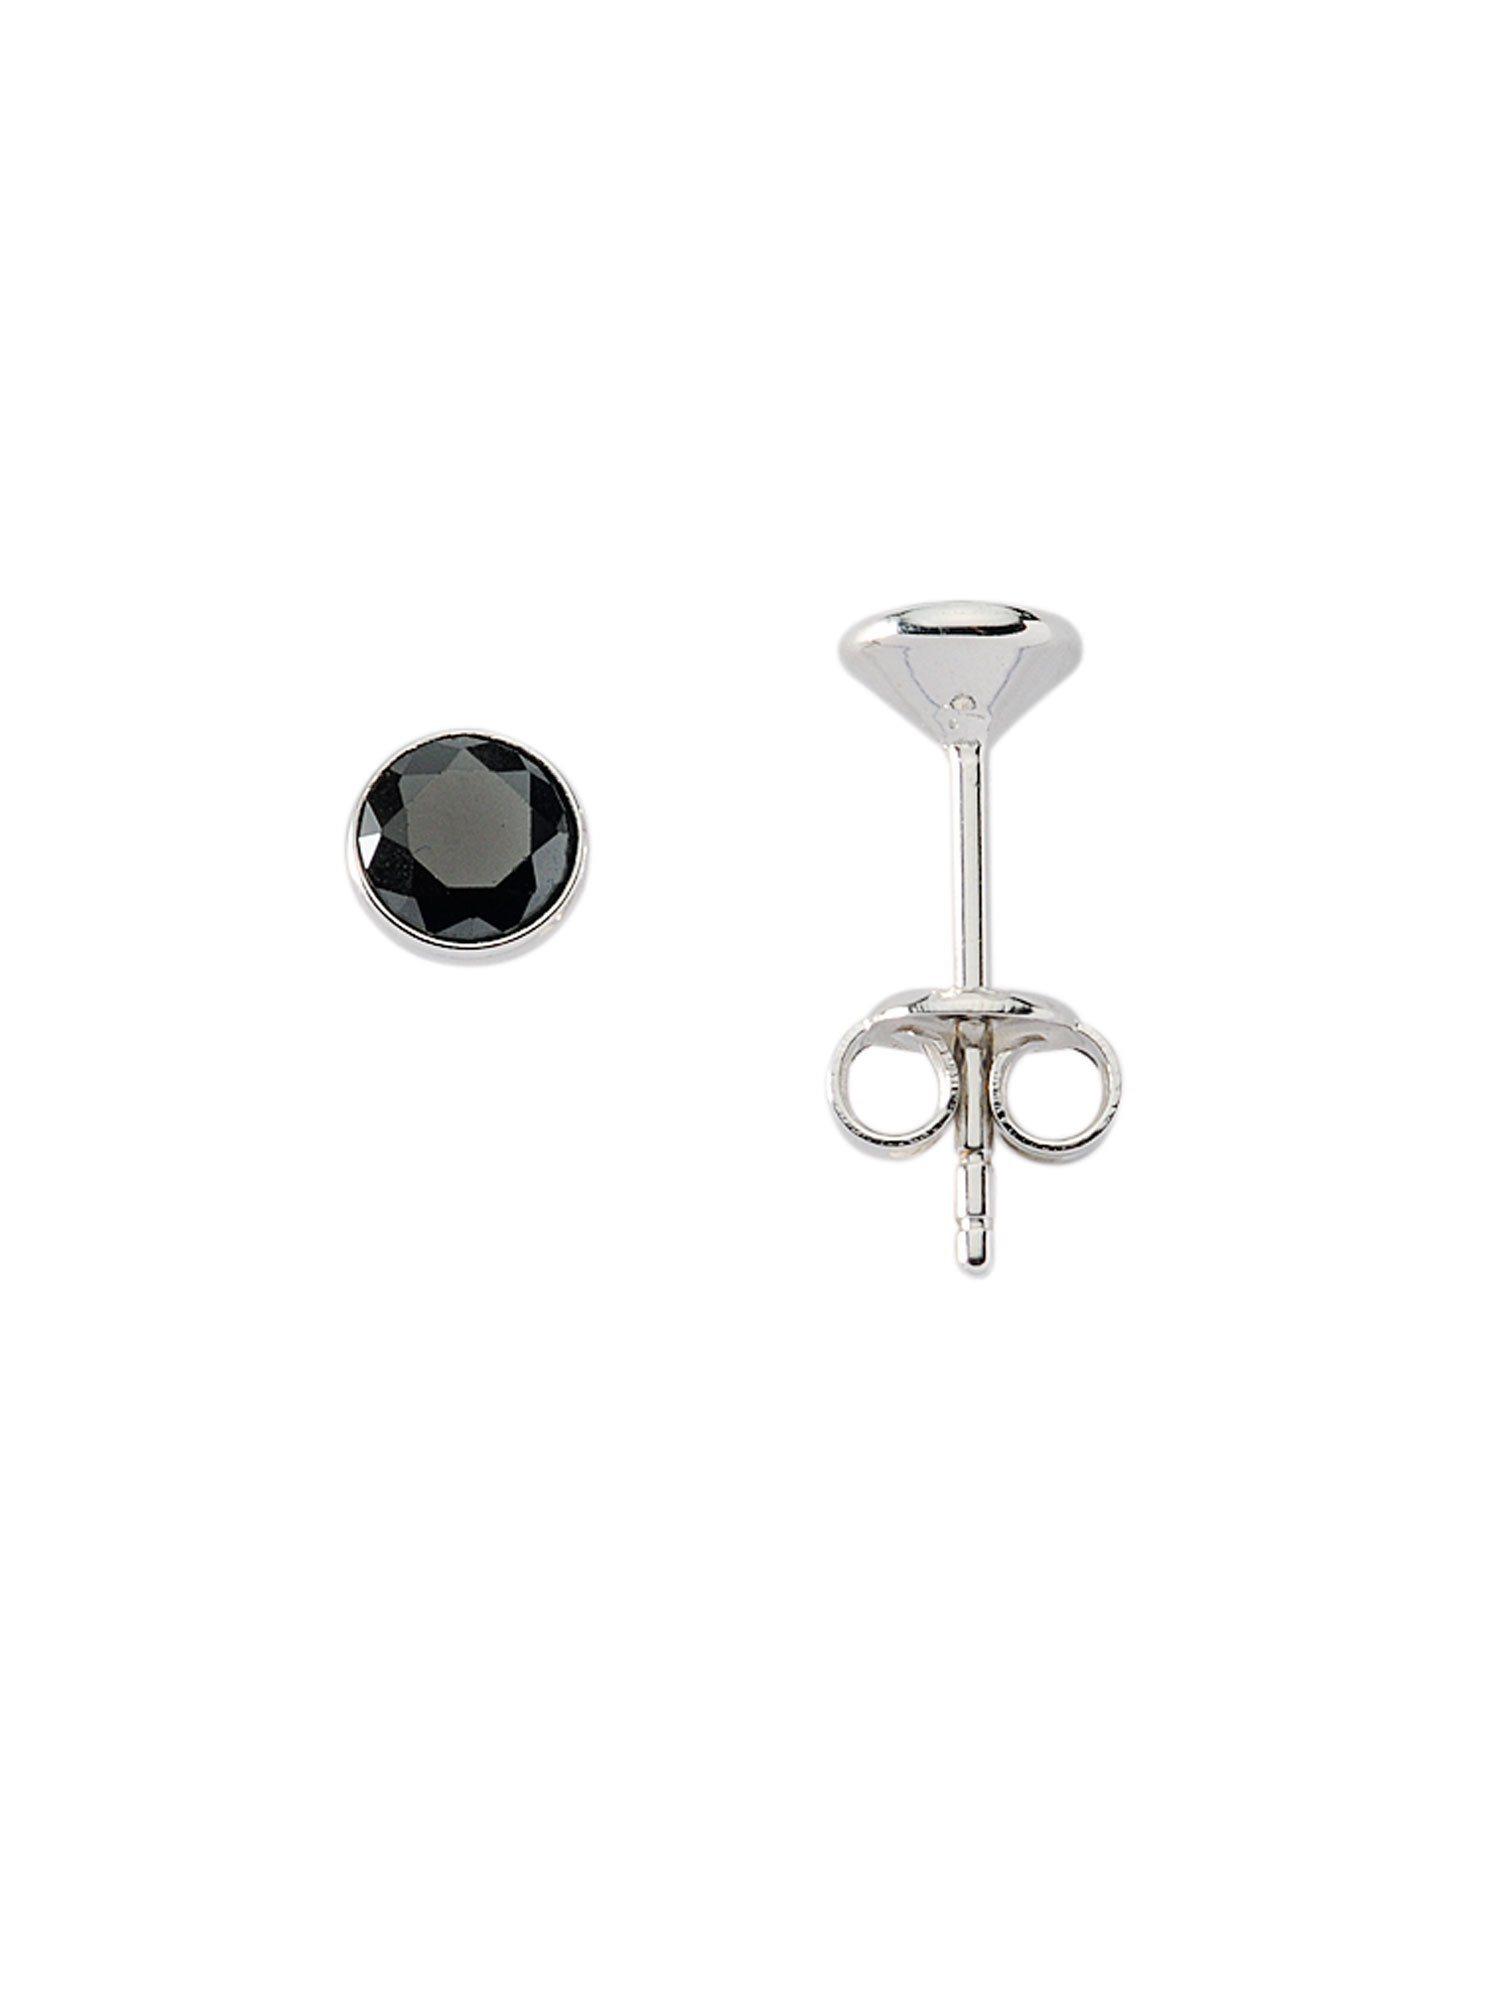 Adelia´s Paar Ohrstecker »Silber Ohrringe« 925 Sterling Silber mit Zirkonia Ø 4.5 mm | Schmuck > Ohrschmuck & Ohrringe > Ohrstecker | Silber | Adelia´s